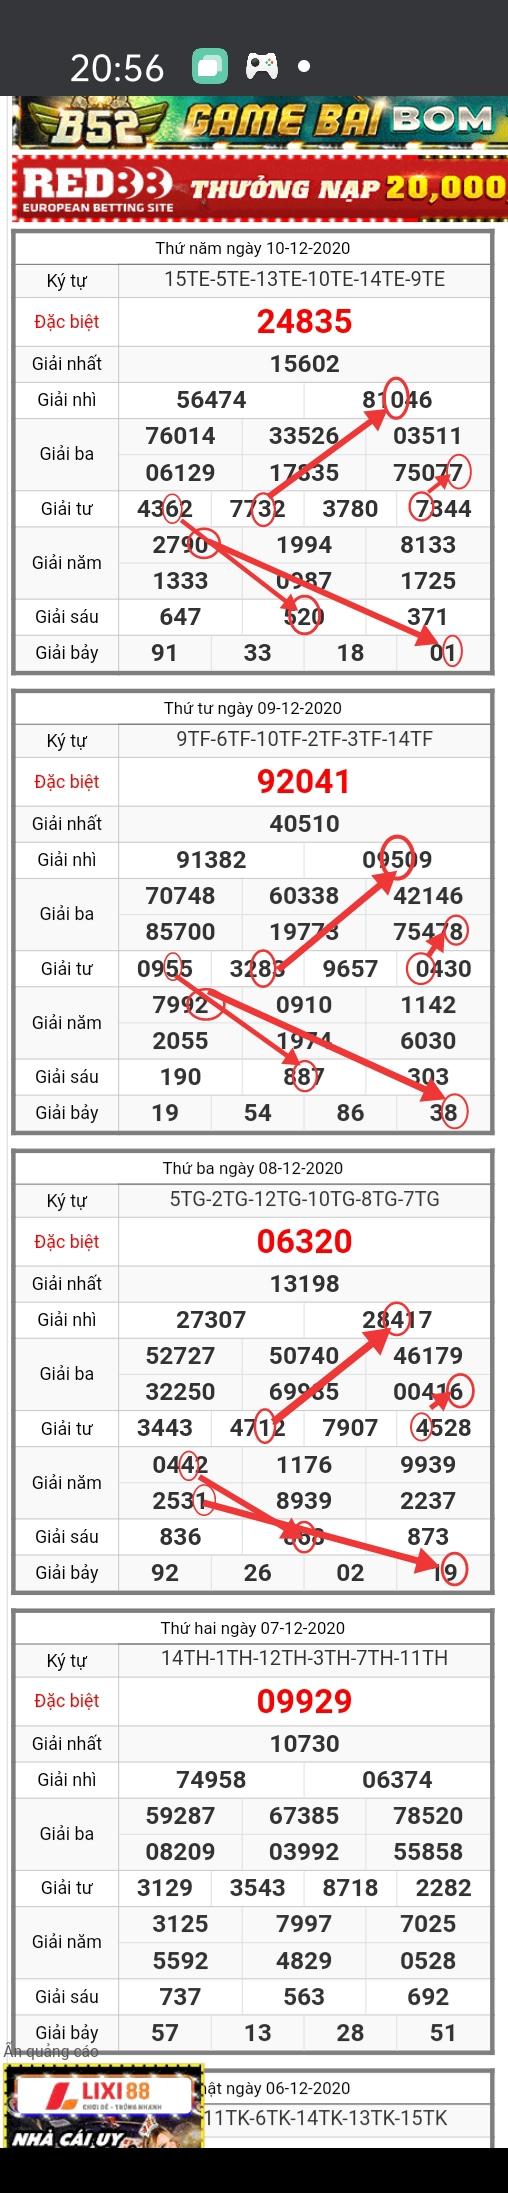 IMG_20201210_210446.jpg